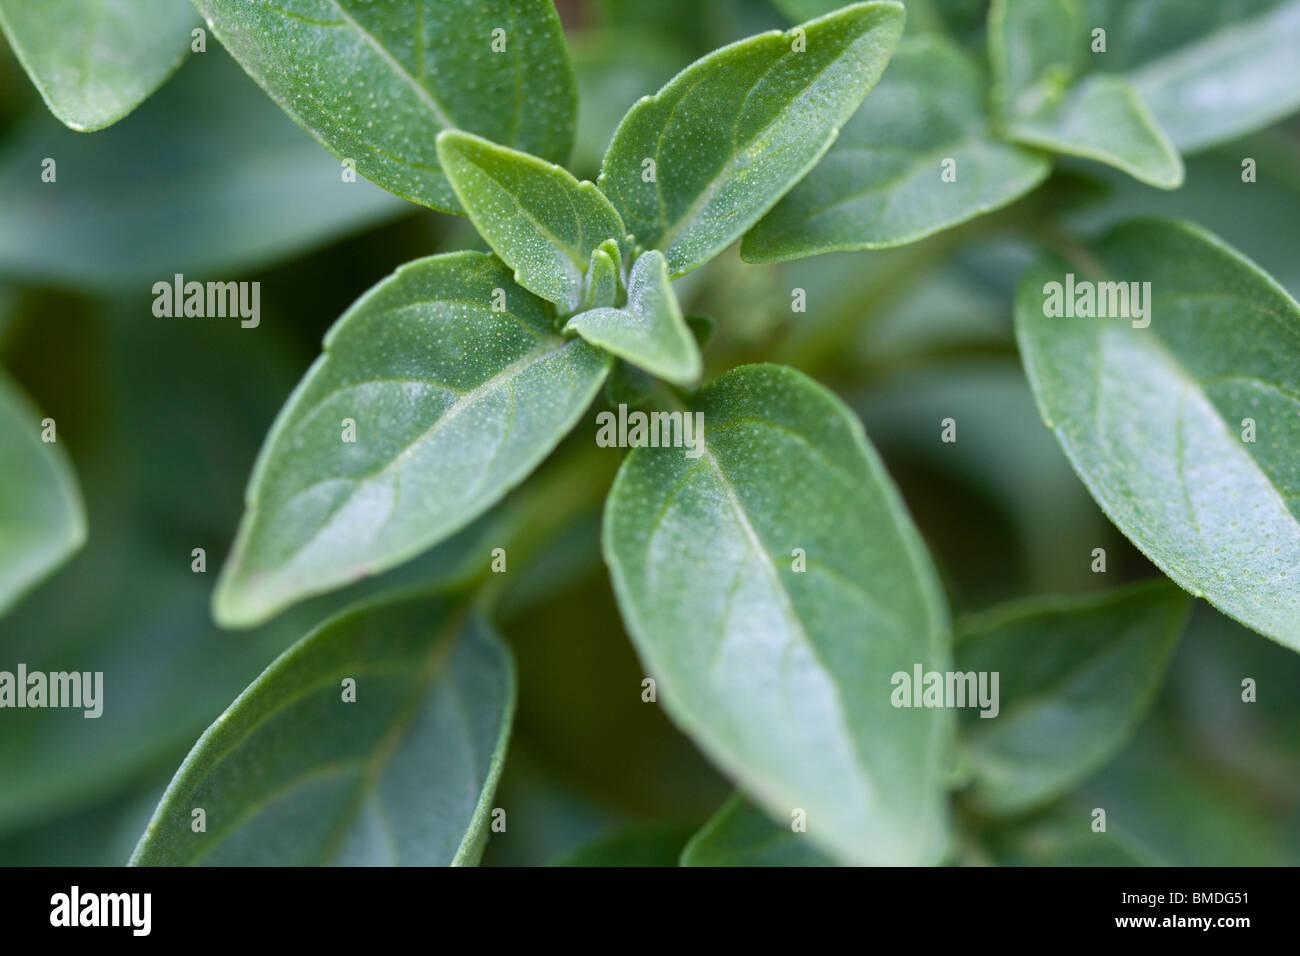 Globo piccante basilico (Ocimum basilicum minimo) cresce in un giardino. Immagini Stock